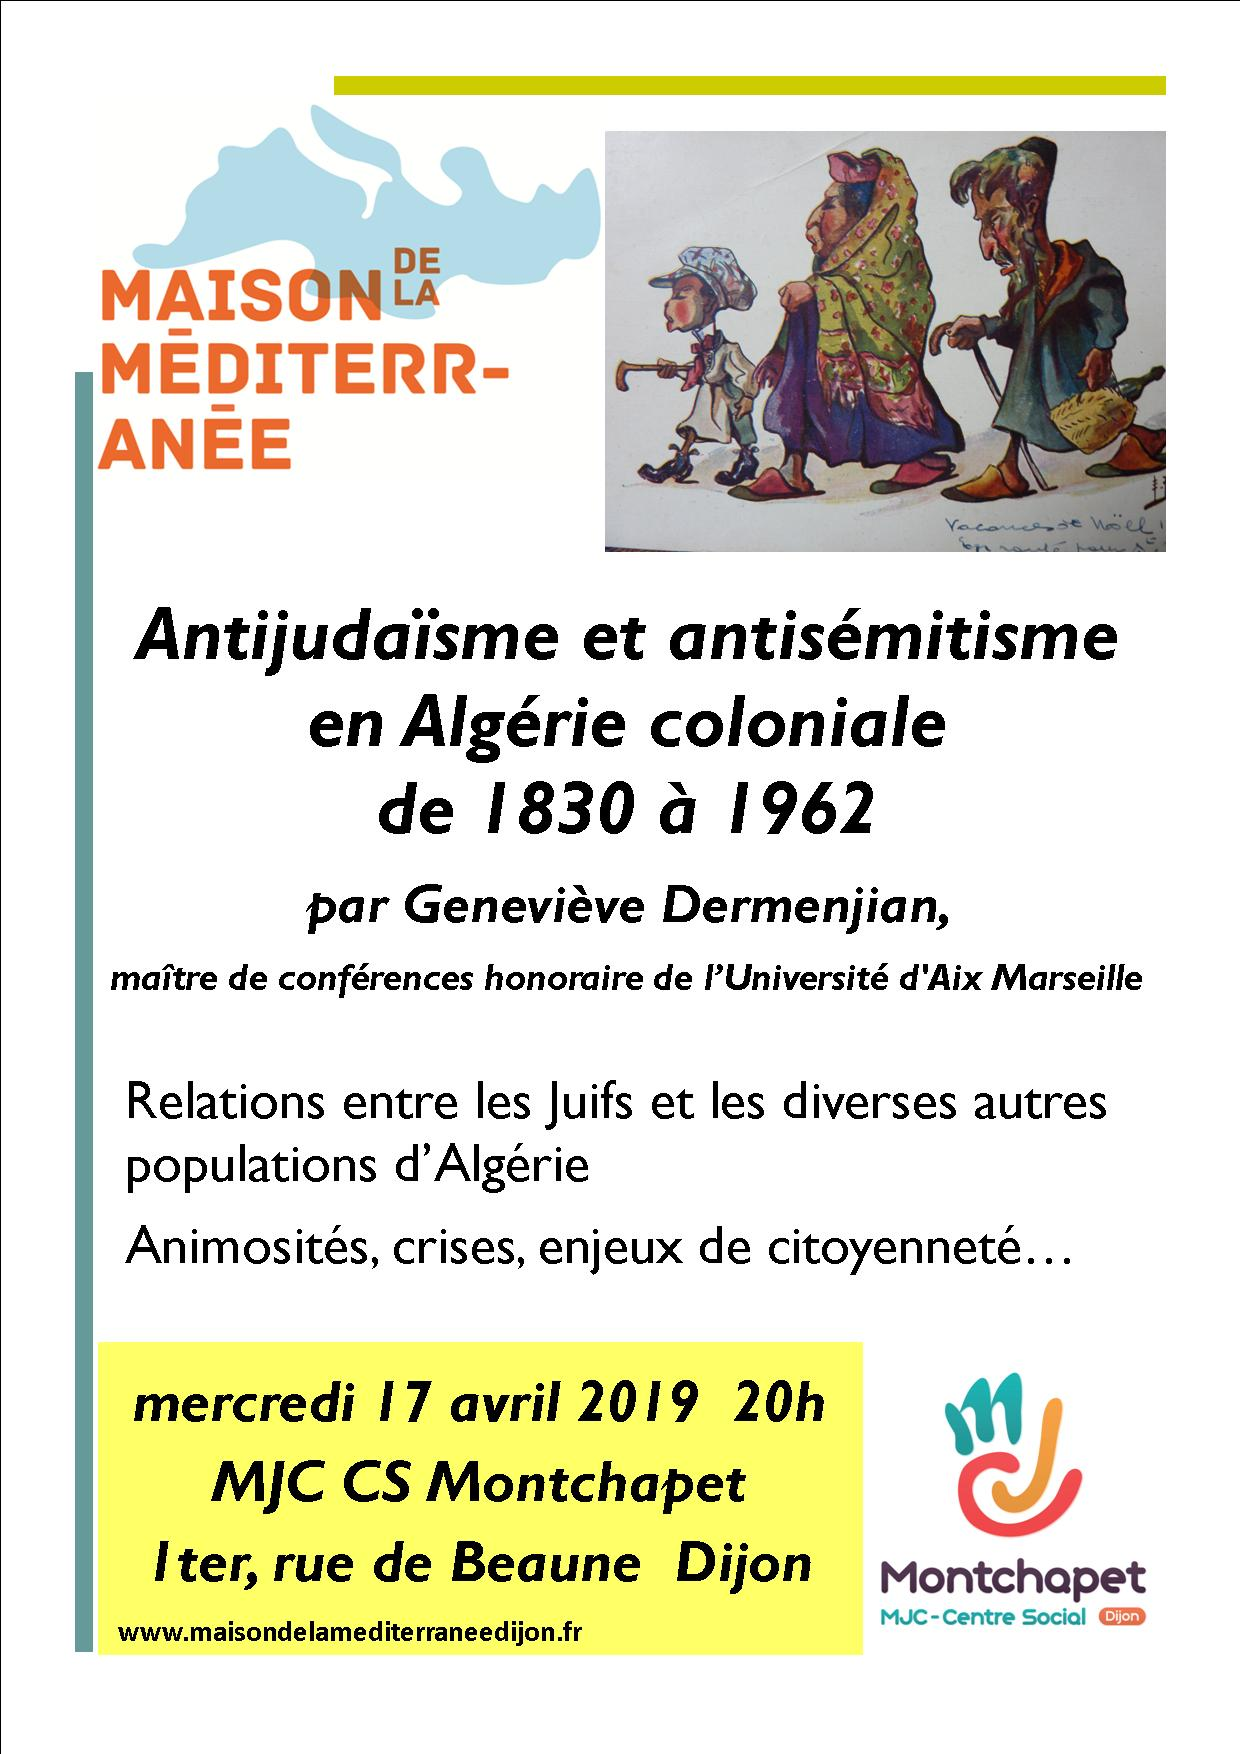 2019 maison de la m diterran e - Maison de la mediterranee ...